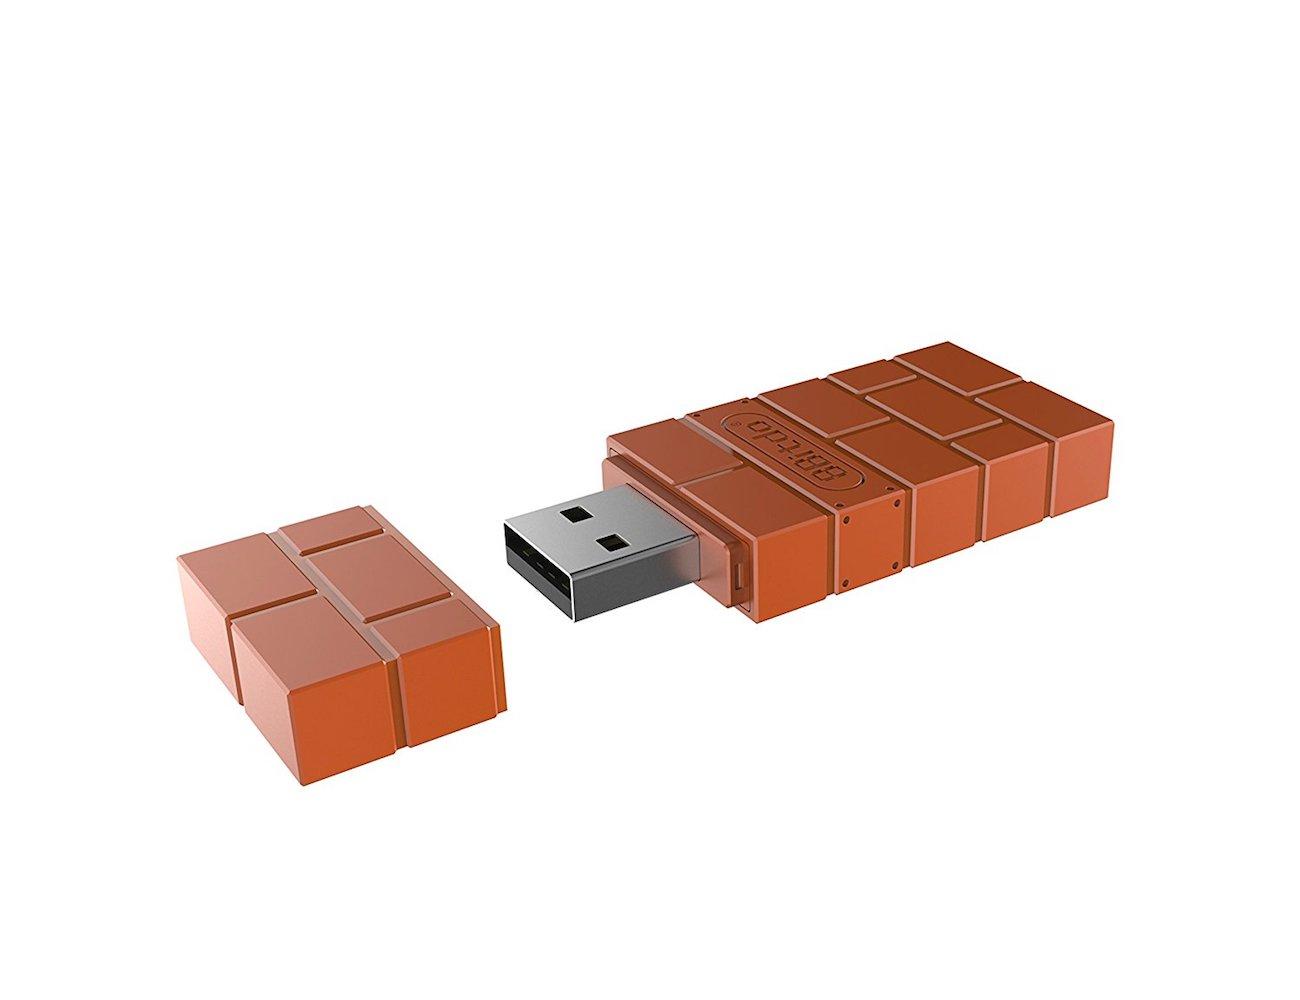 8Bitdo Wireless Bluetooth USB Adapter